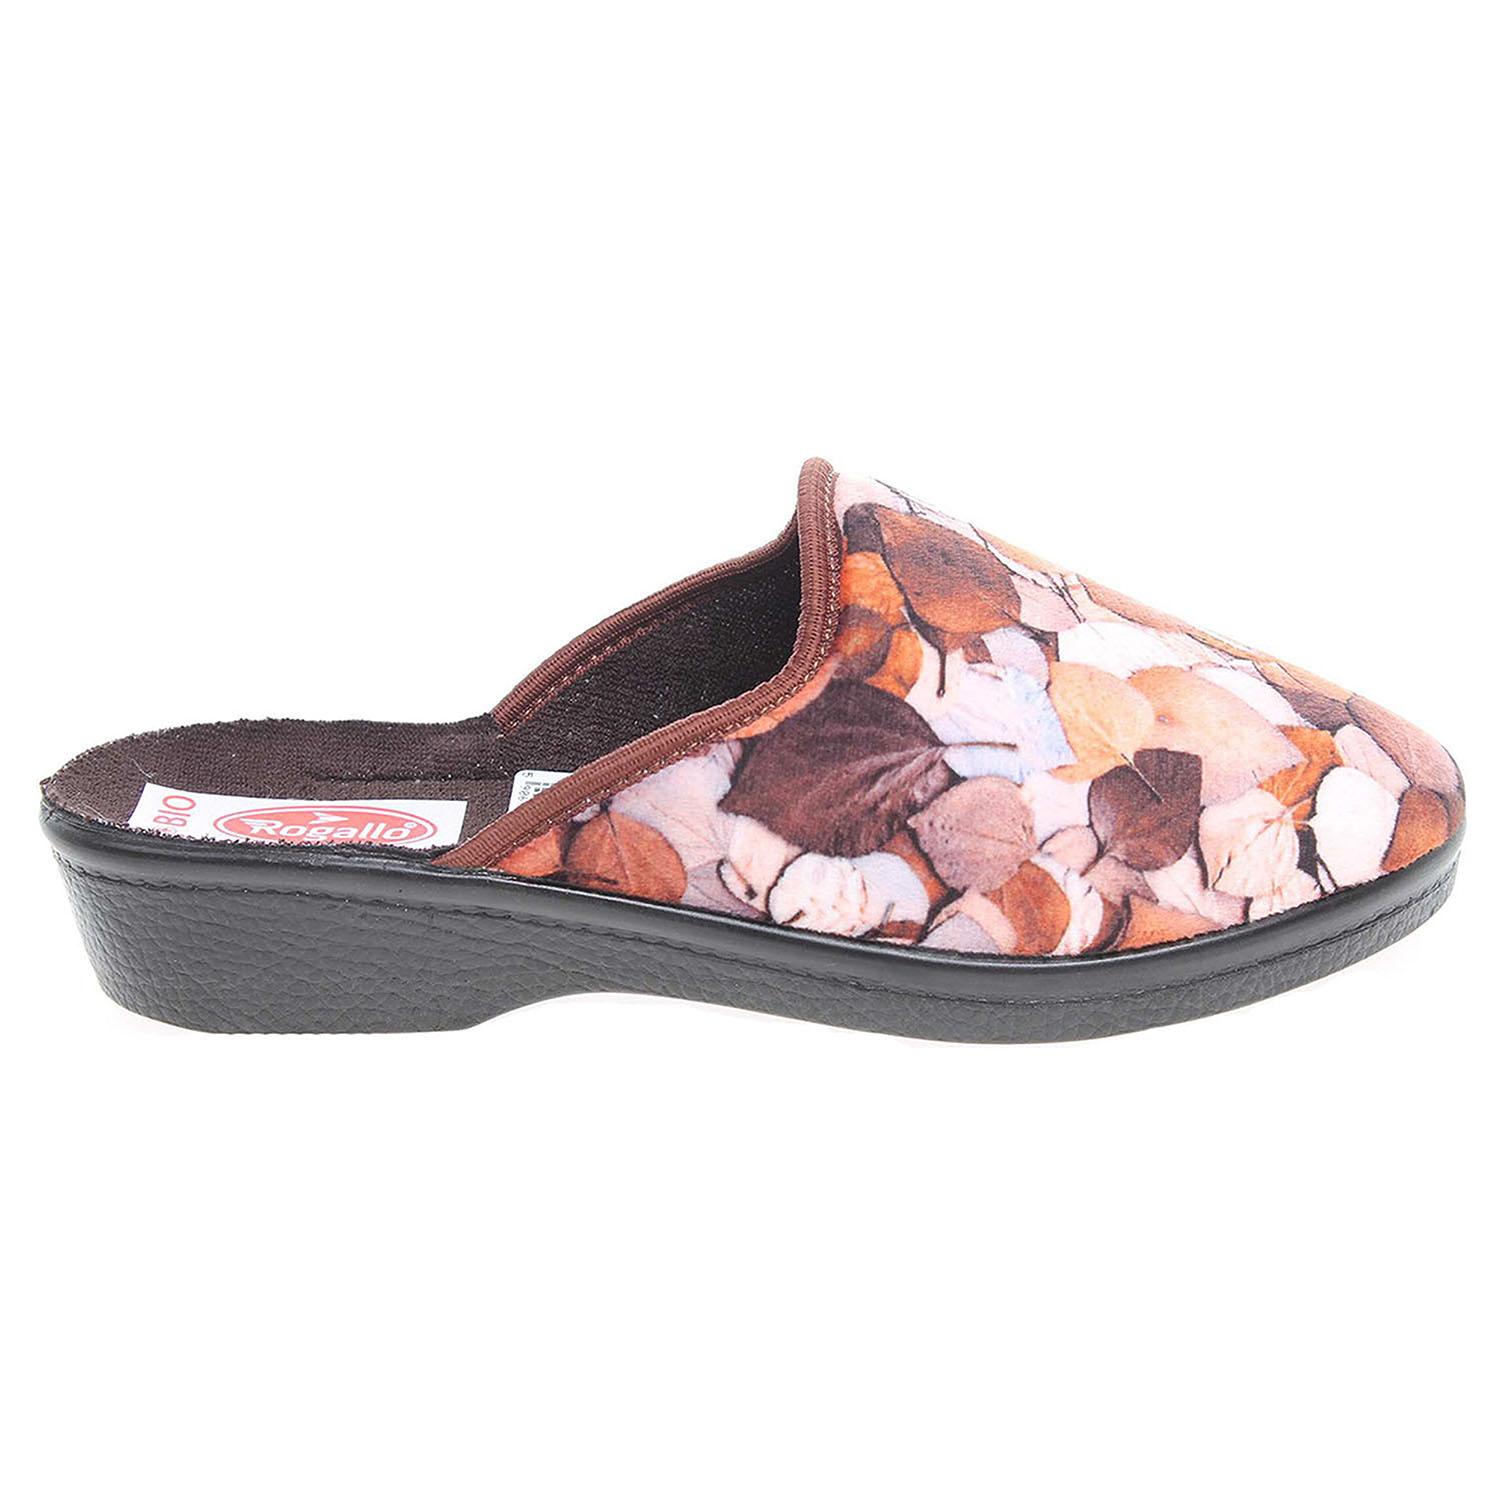 Rogallo dámské pantofle 21017 hnědé 41